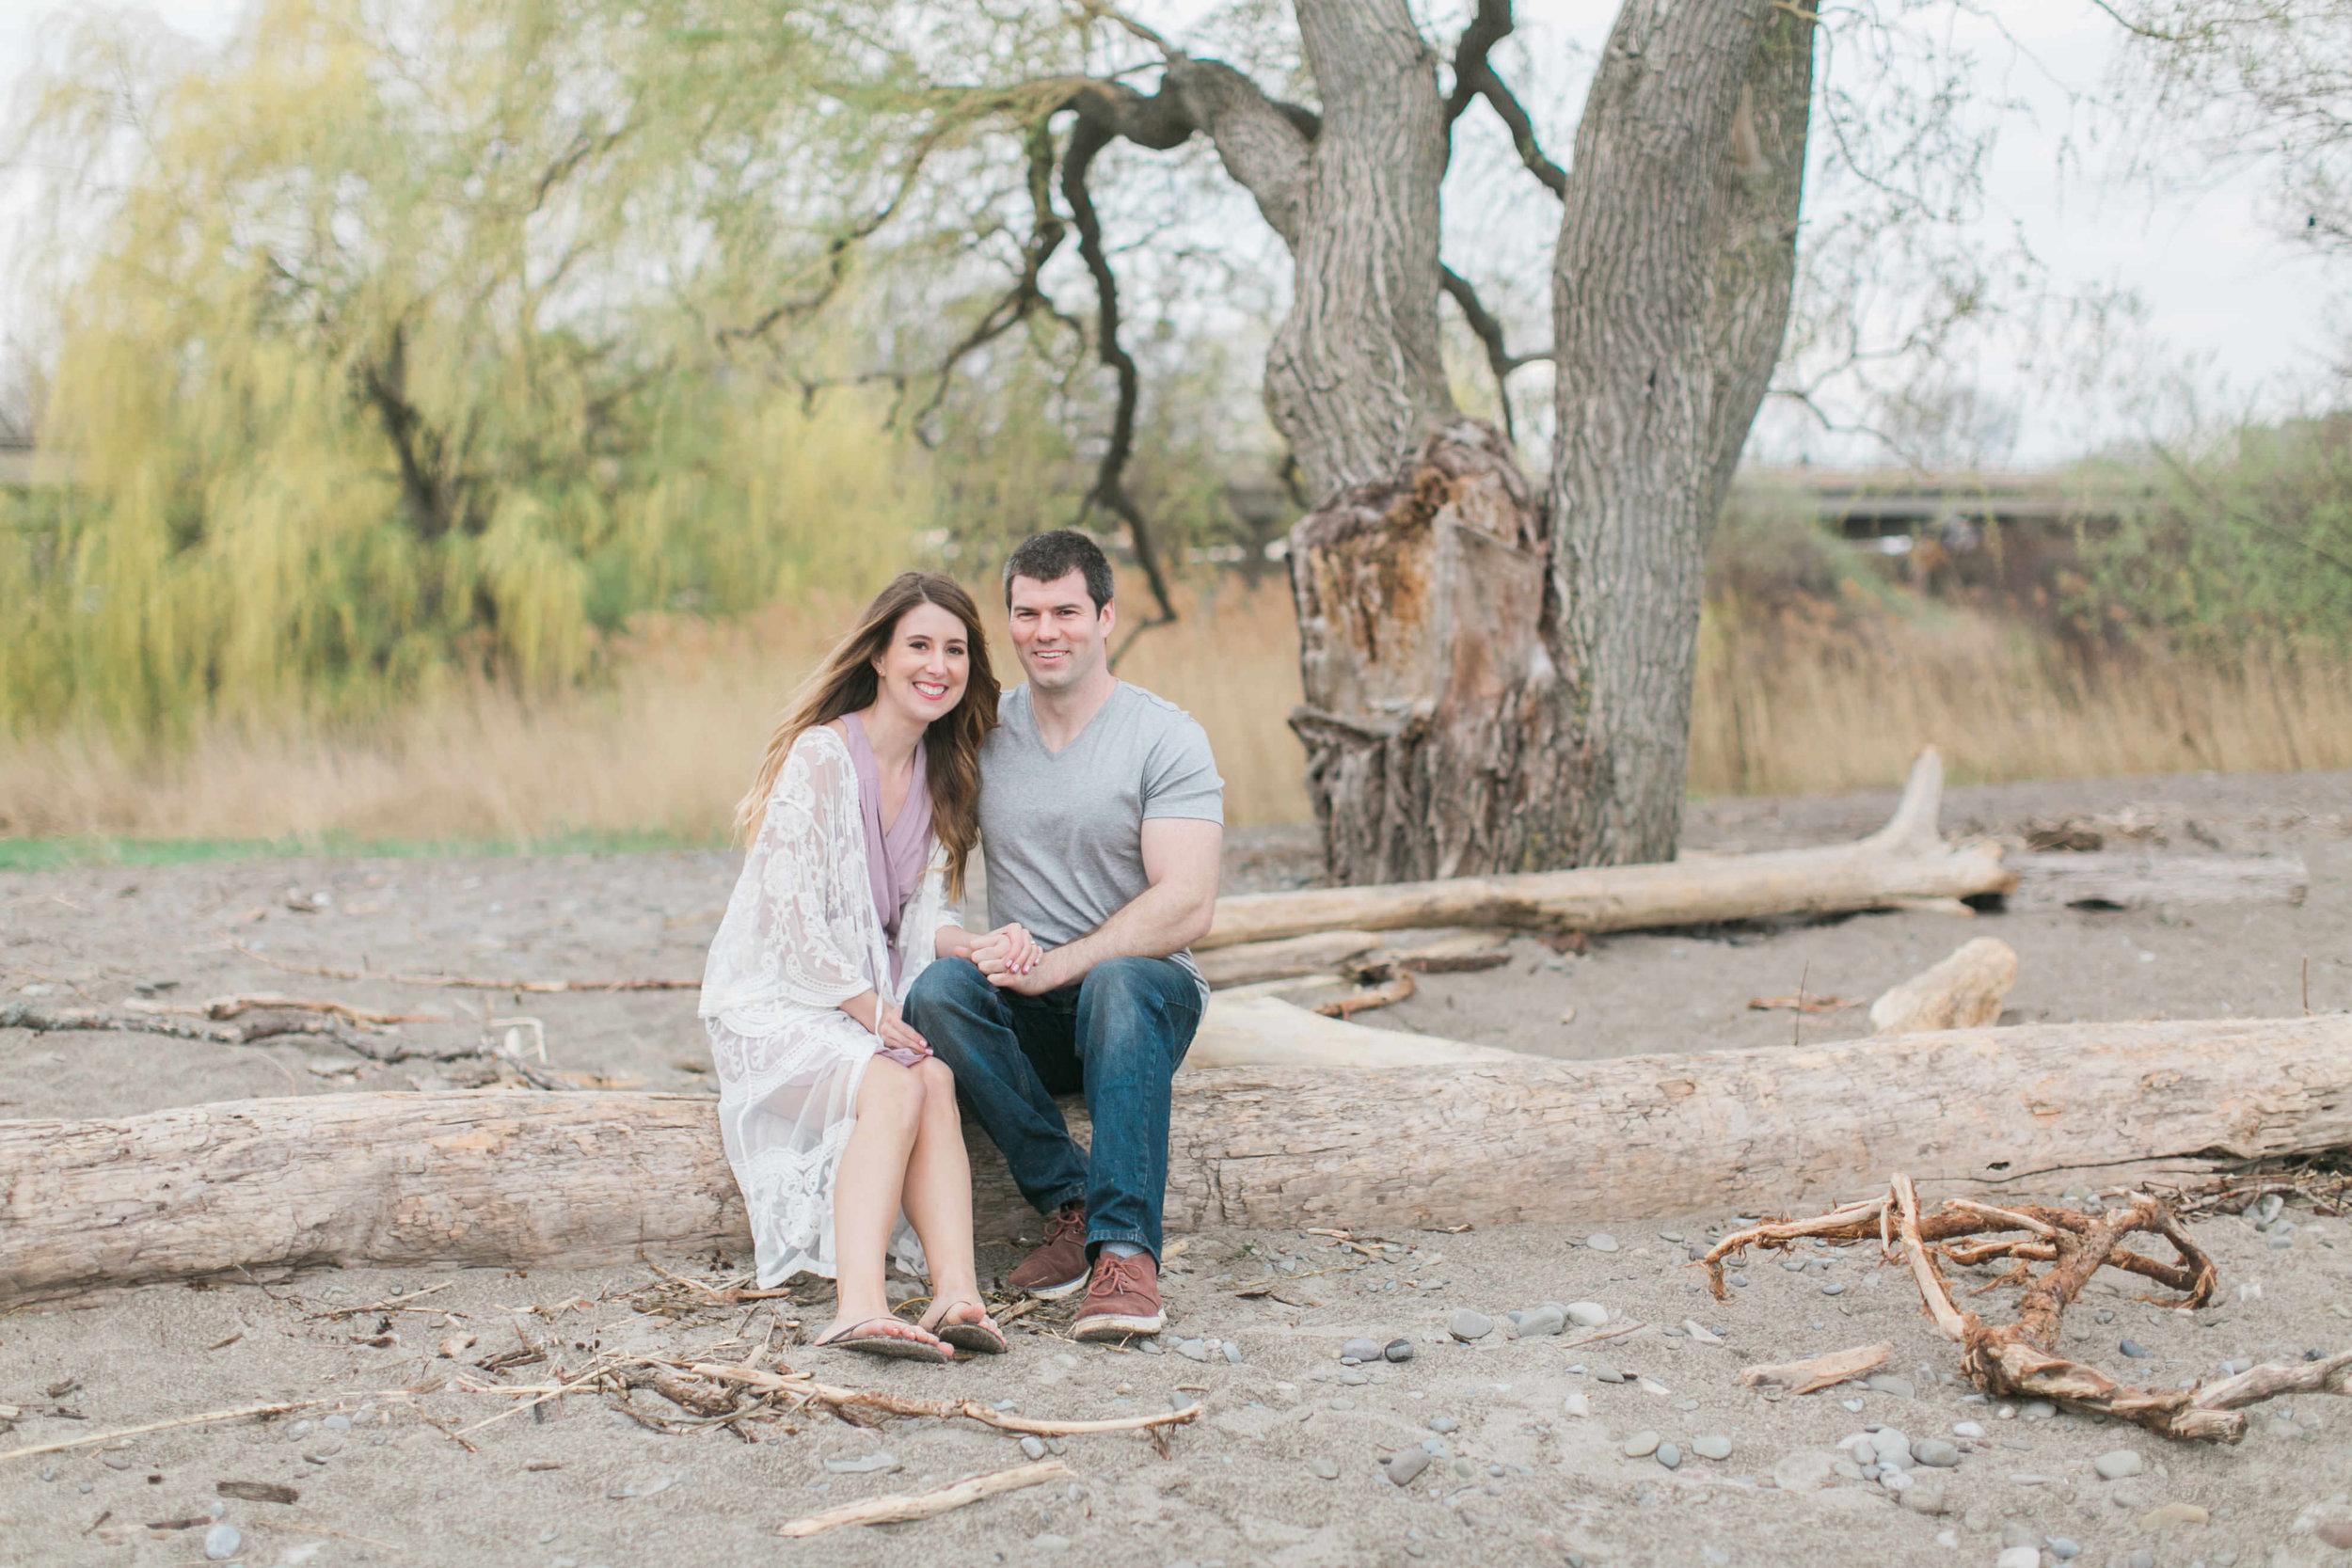 Holly___Ian___Engagement_Session___Daniel_Ricci_Wedding_Photography_59.jpg